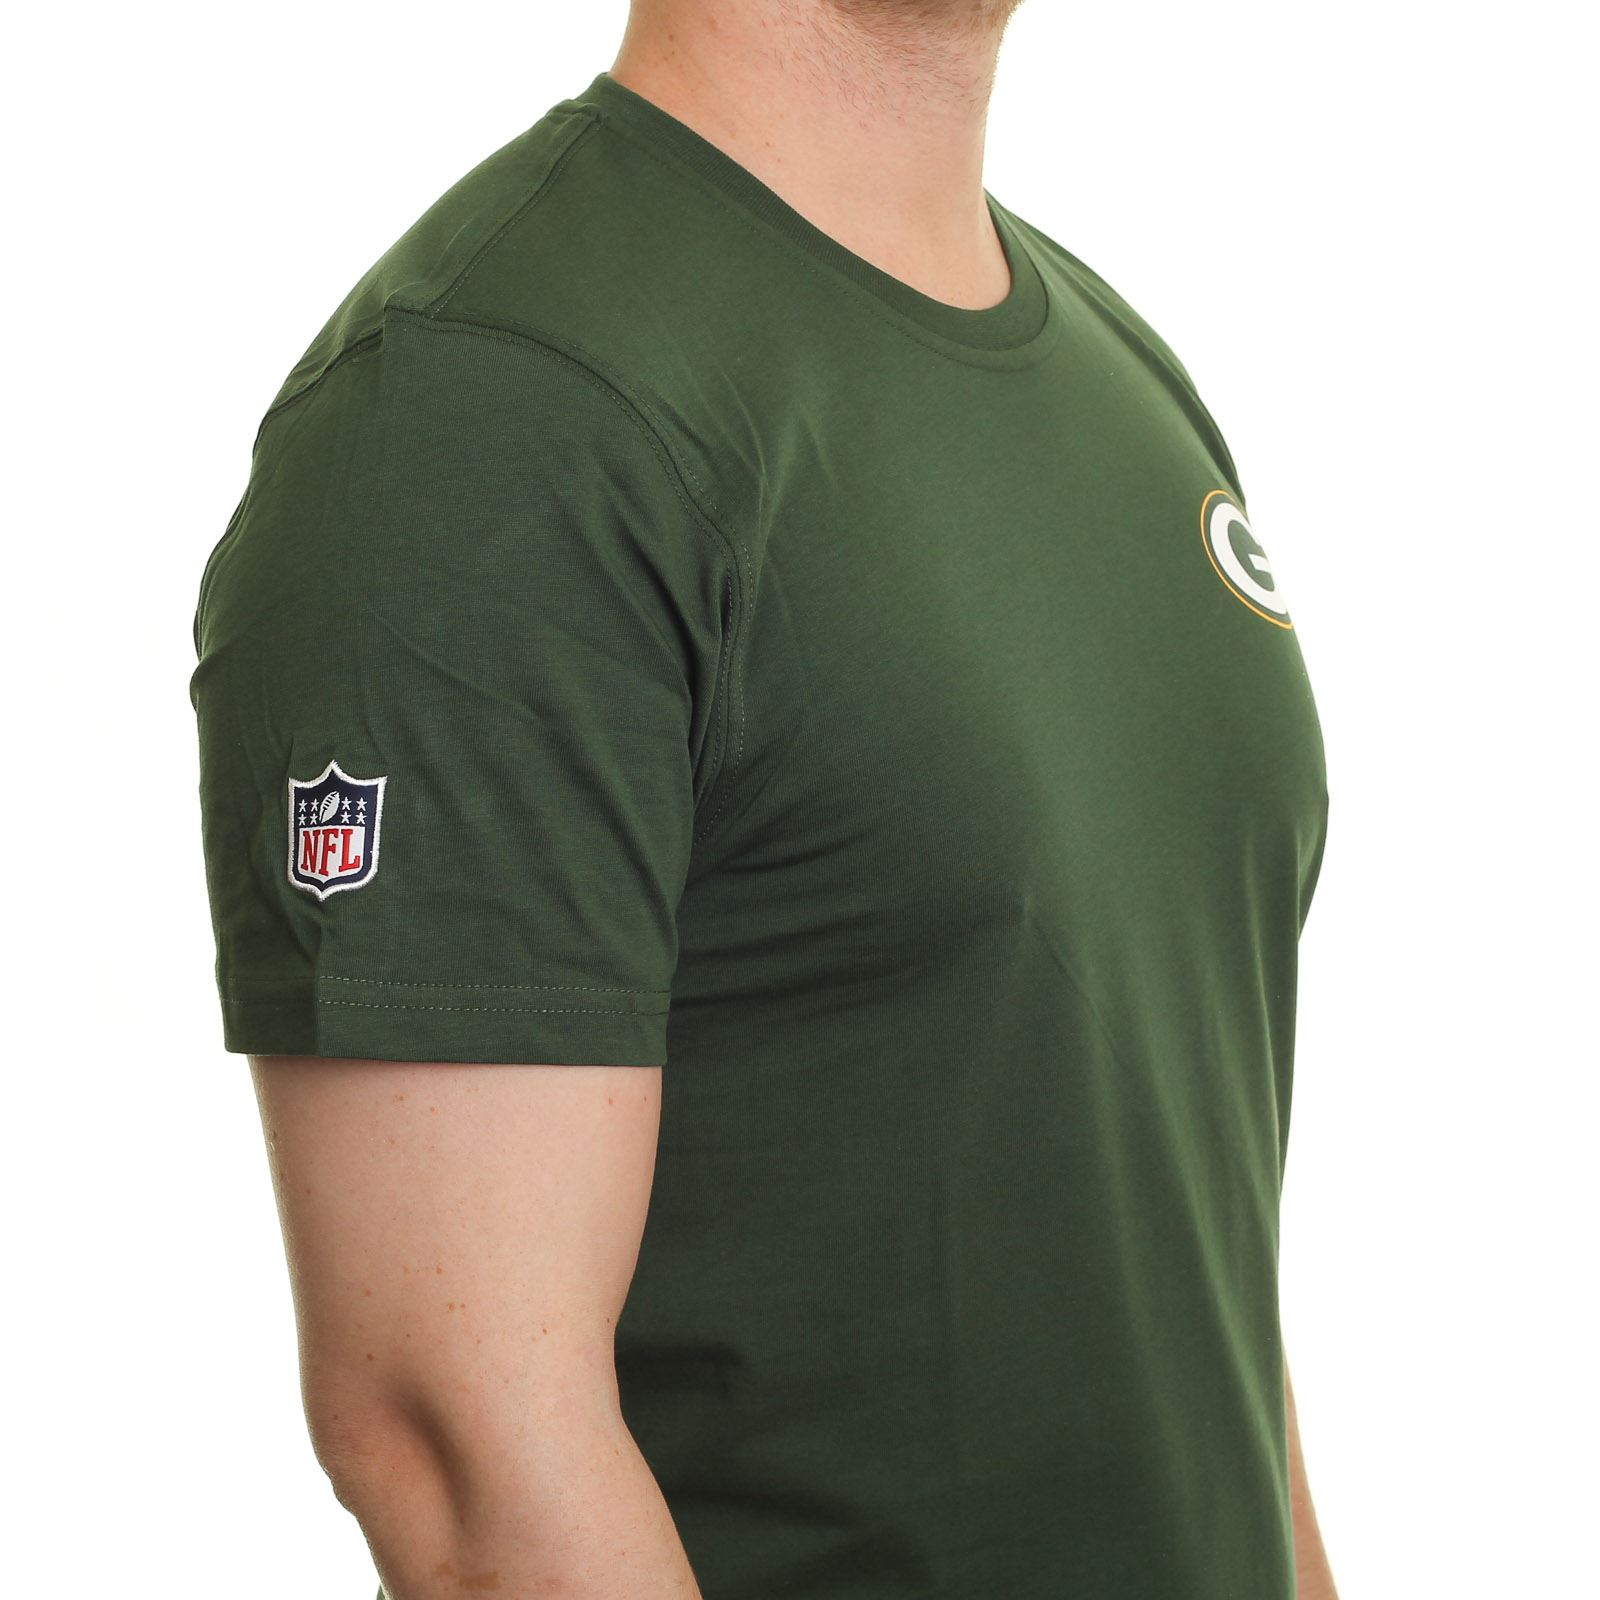 New-Era-Team-Apparel-T-Shirt-Green-Bay-Packers